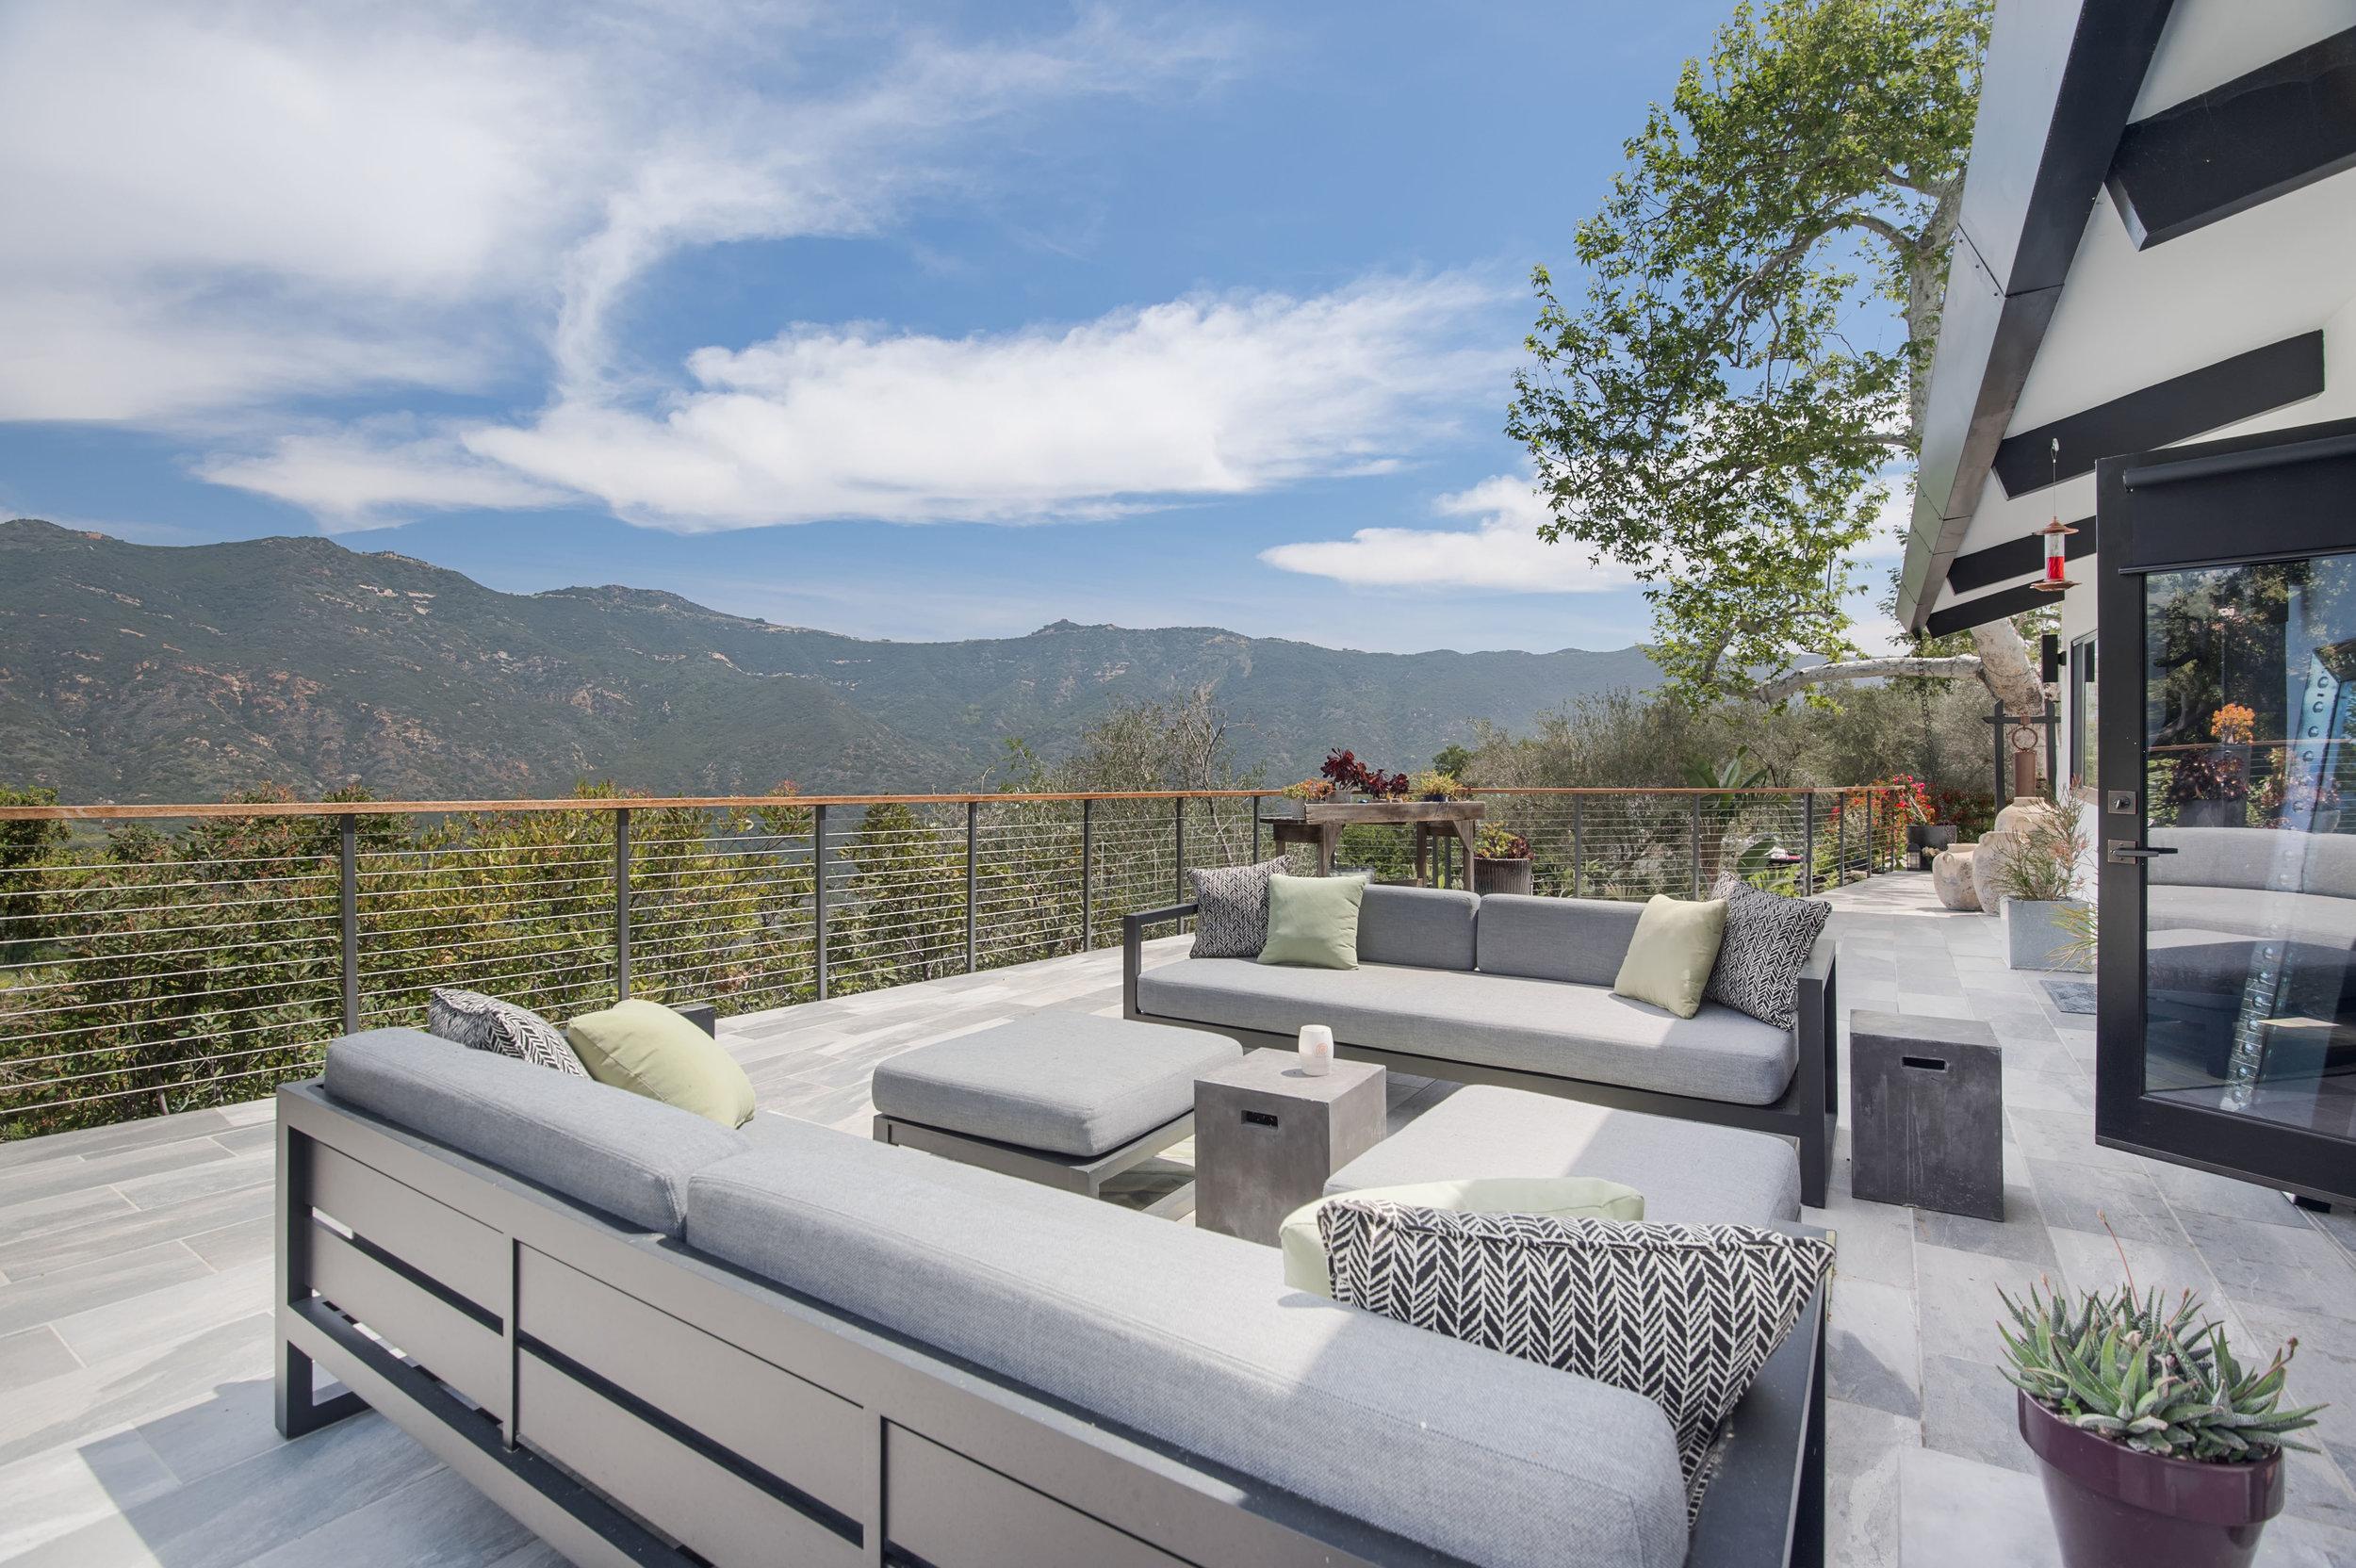 002 Exterior 26272 Cool Glen Way Malibu For Sale Luxury Real Estate.jpg